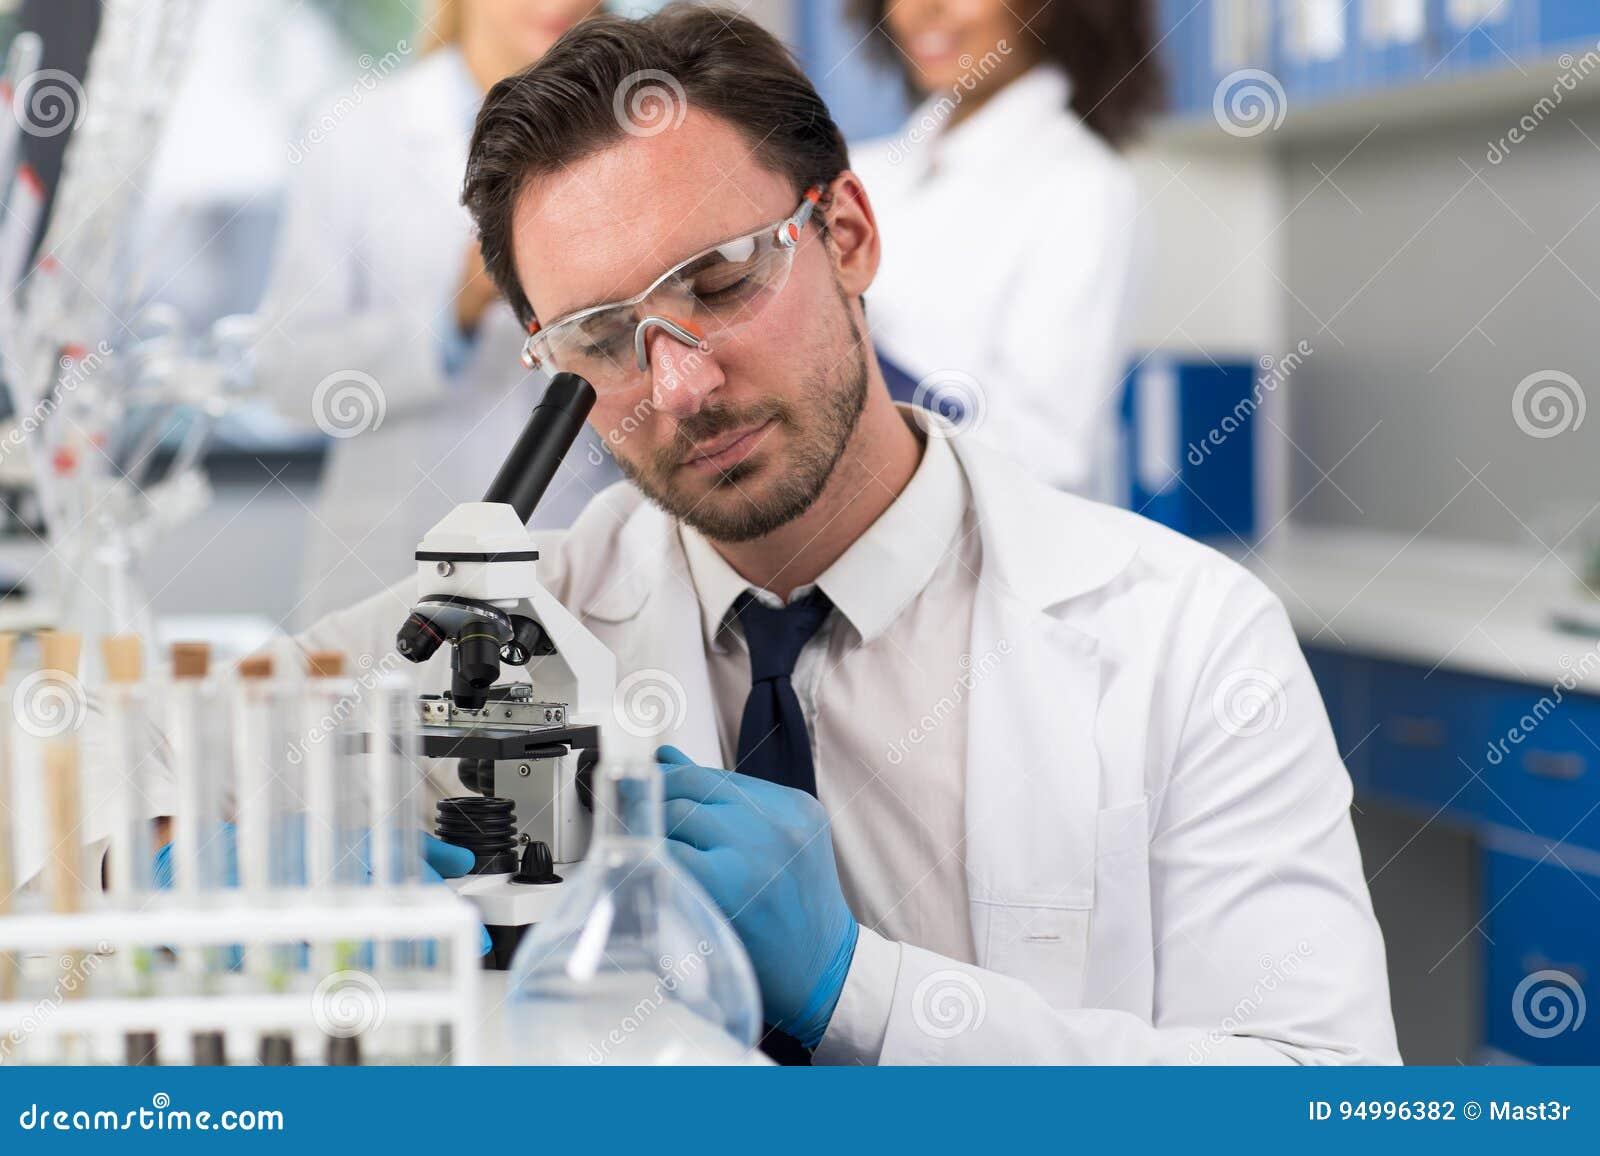 Wissenschaftler Looking Through Microscope im Labor, männlicher Forscher Doing Research Experiments